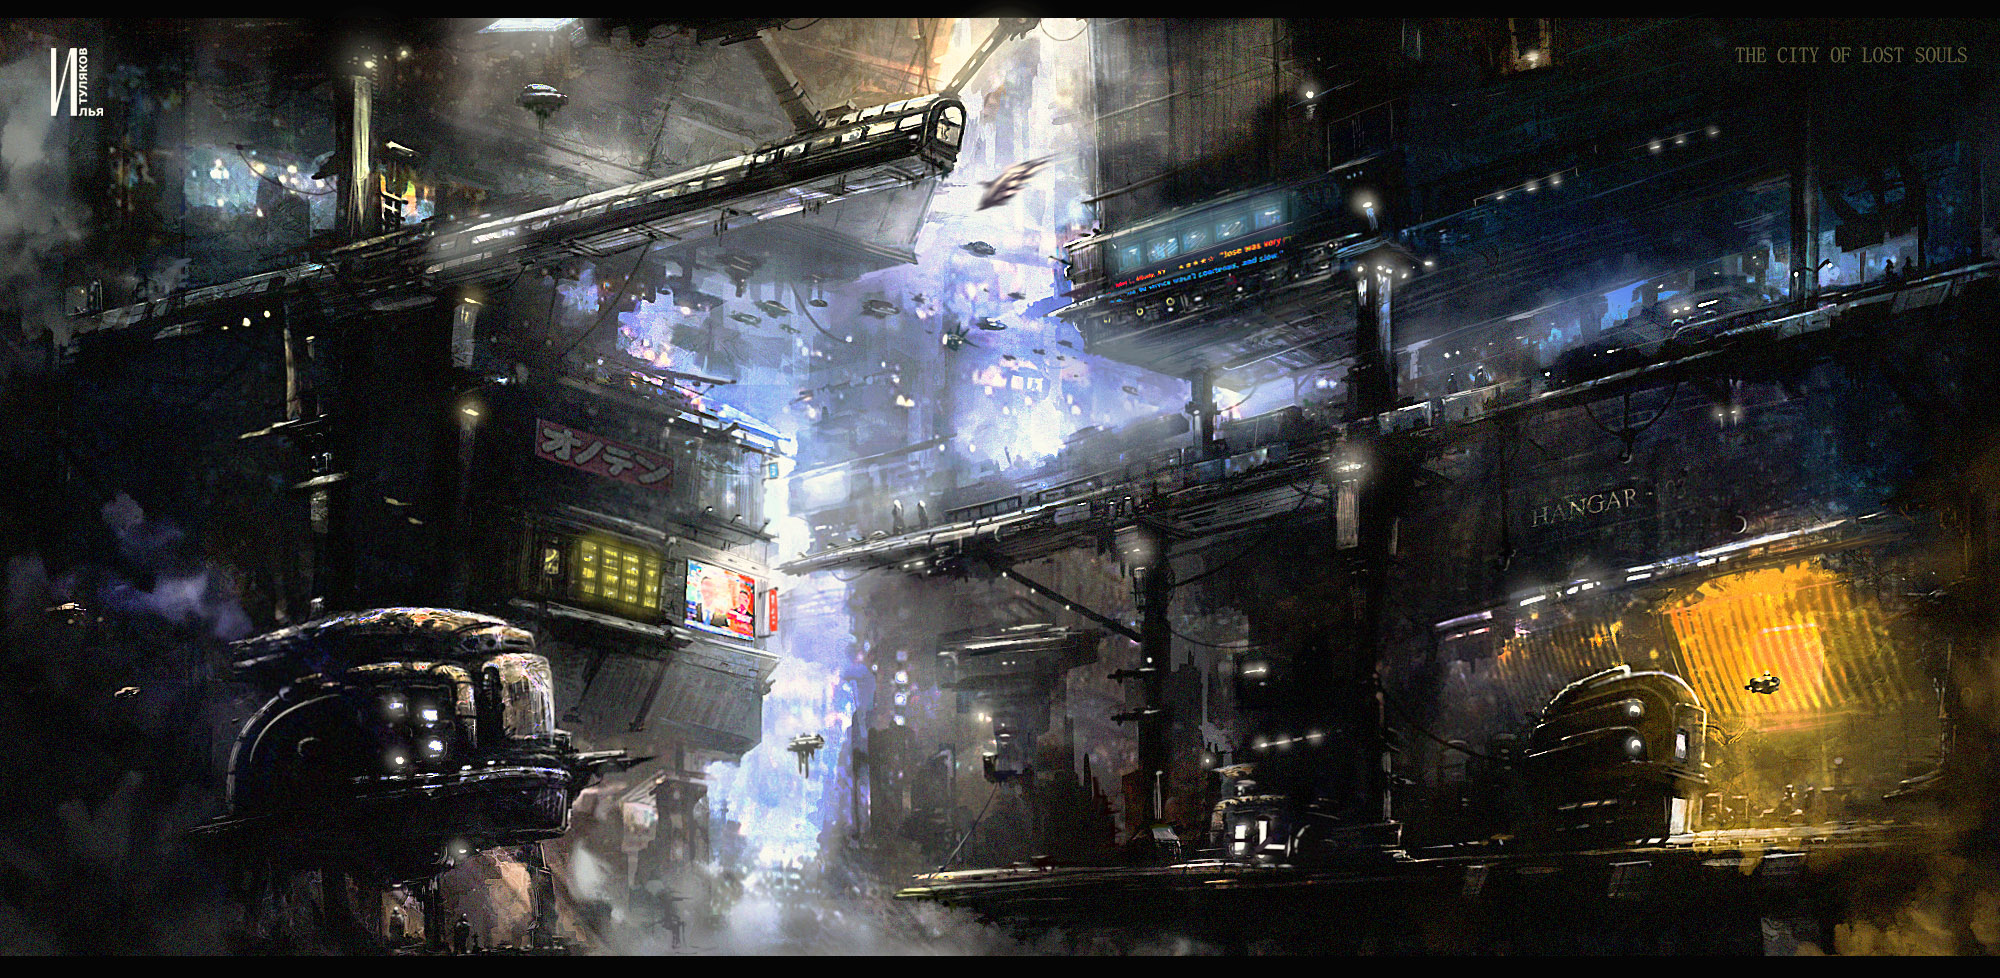 THE CITY OF LOST SOULS by RaZuMinc